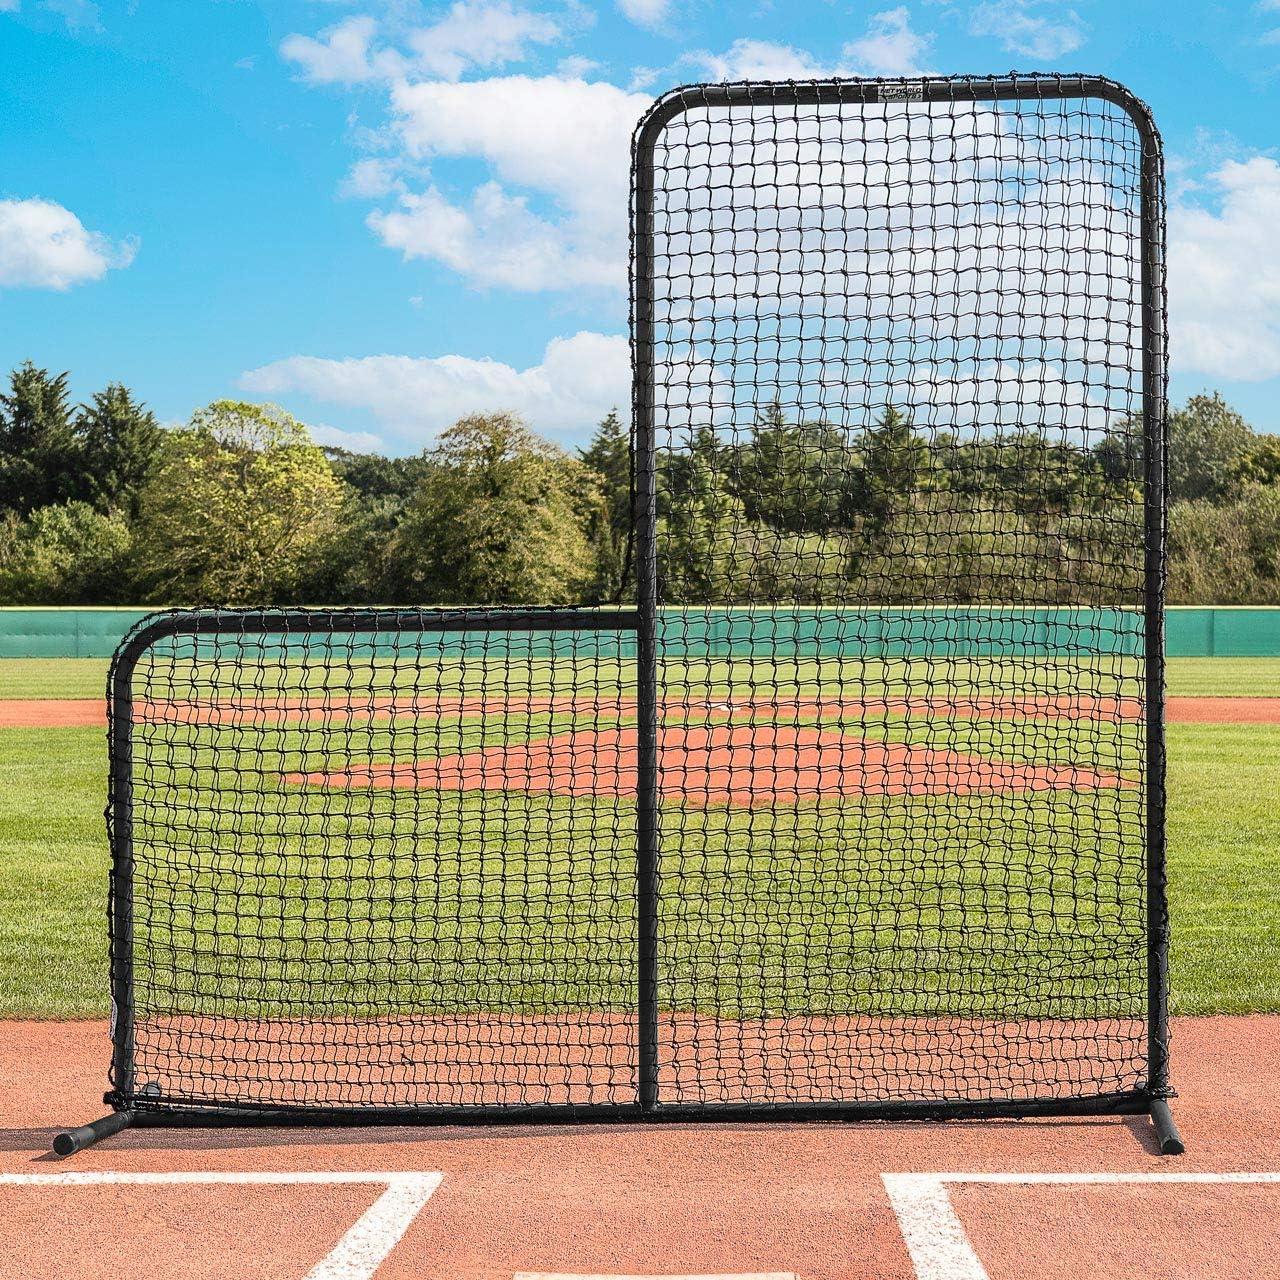 Amazon Com Fortress Regulation Baseball L Screen 7ft X 7ft Premium Grade Pitcher Protector Screen Baseball Net L Screen Baseball Practice Equipment Baseball Pitching Net Sports Outdoors